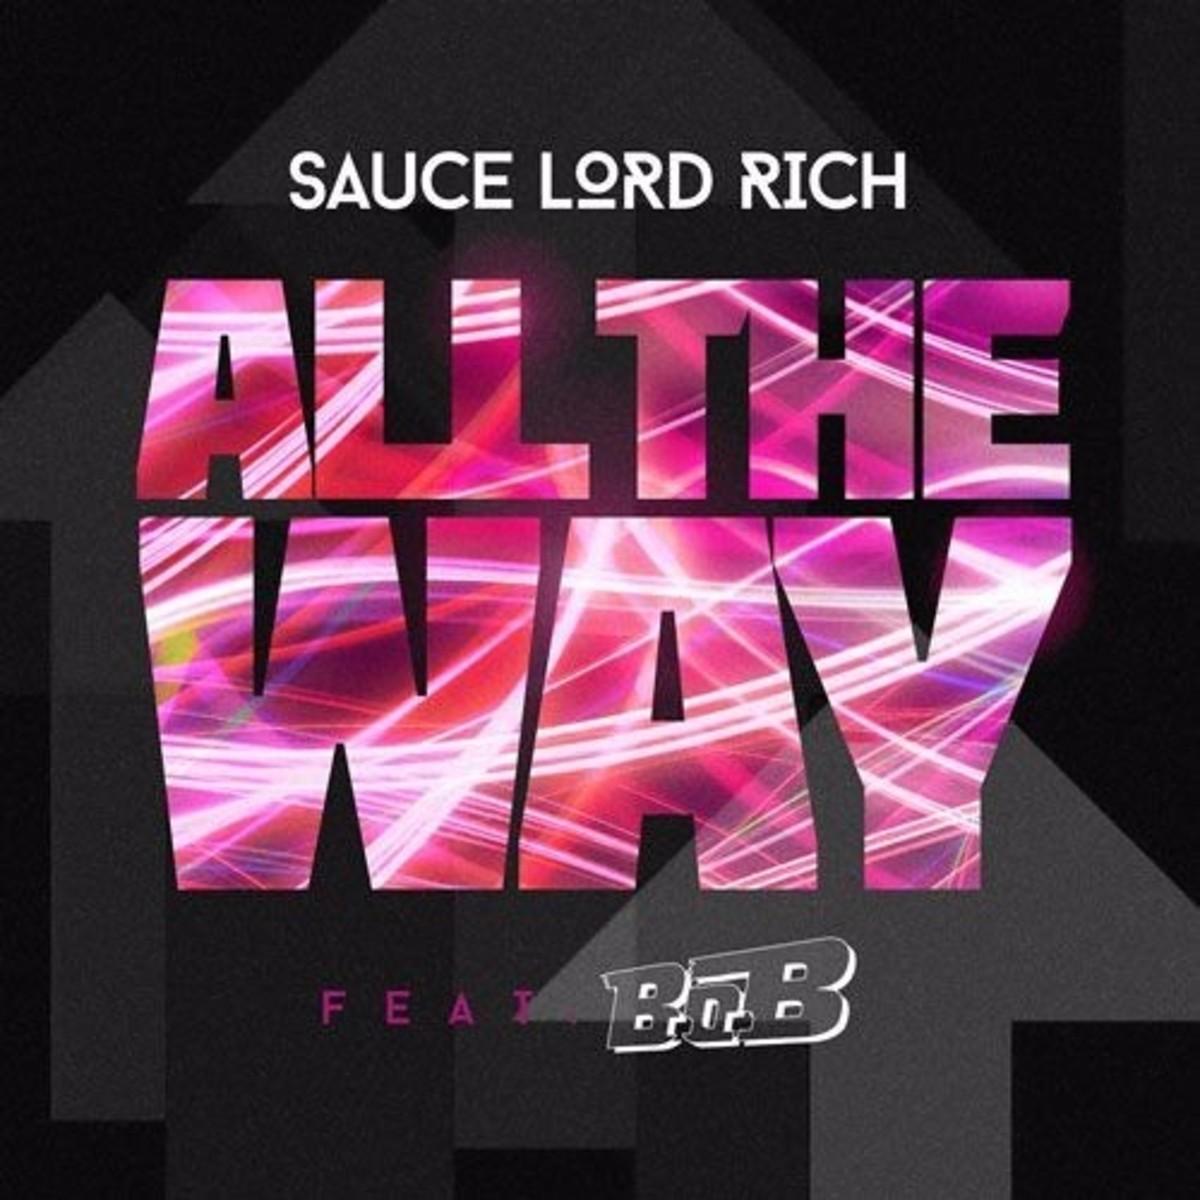 saucelordrich-all-the-way.jpg